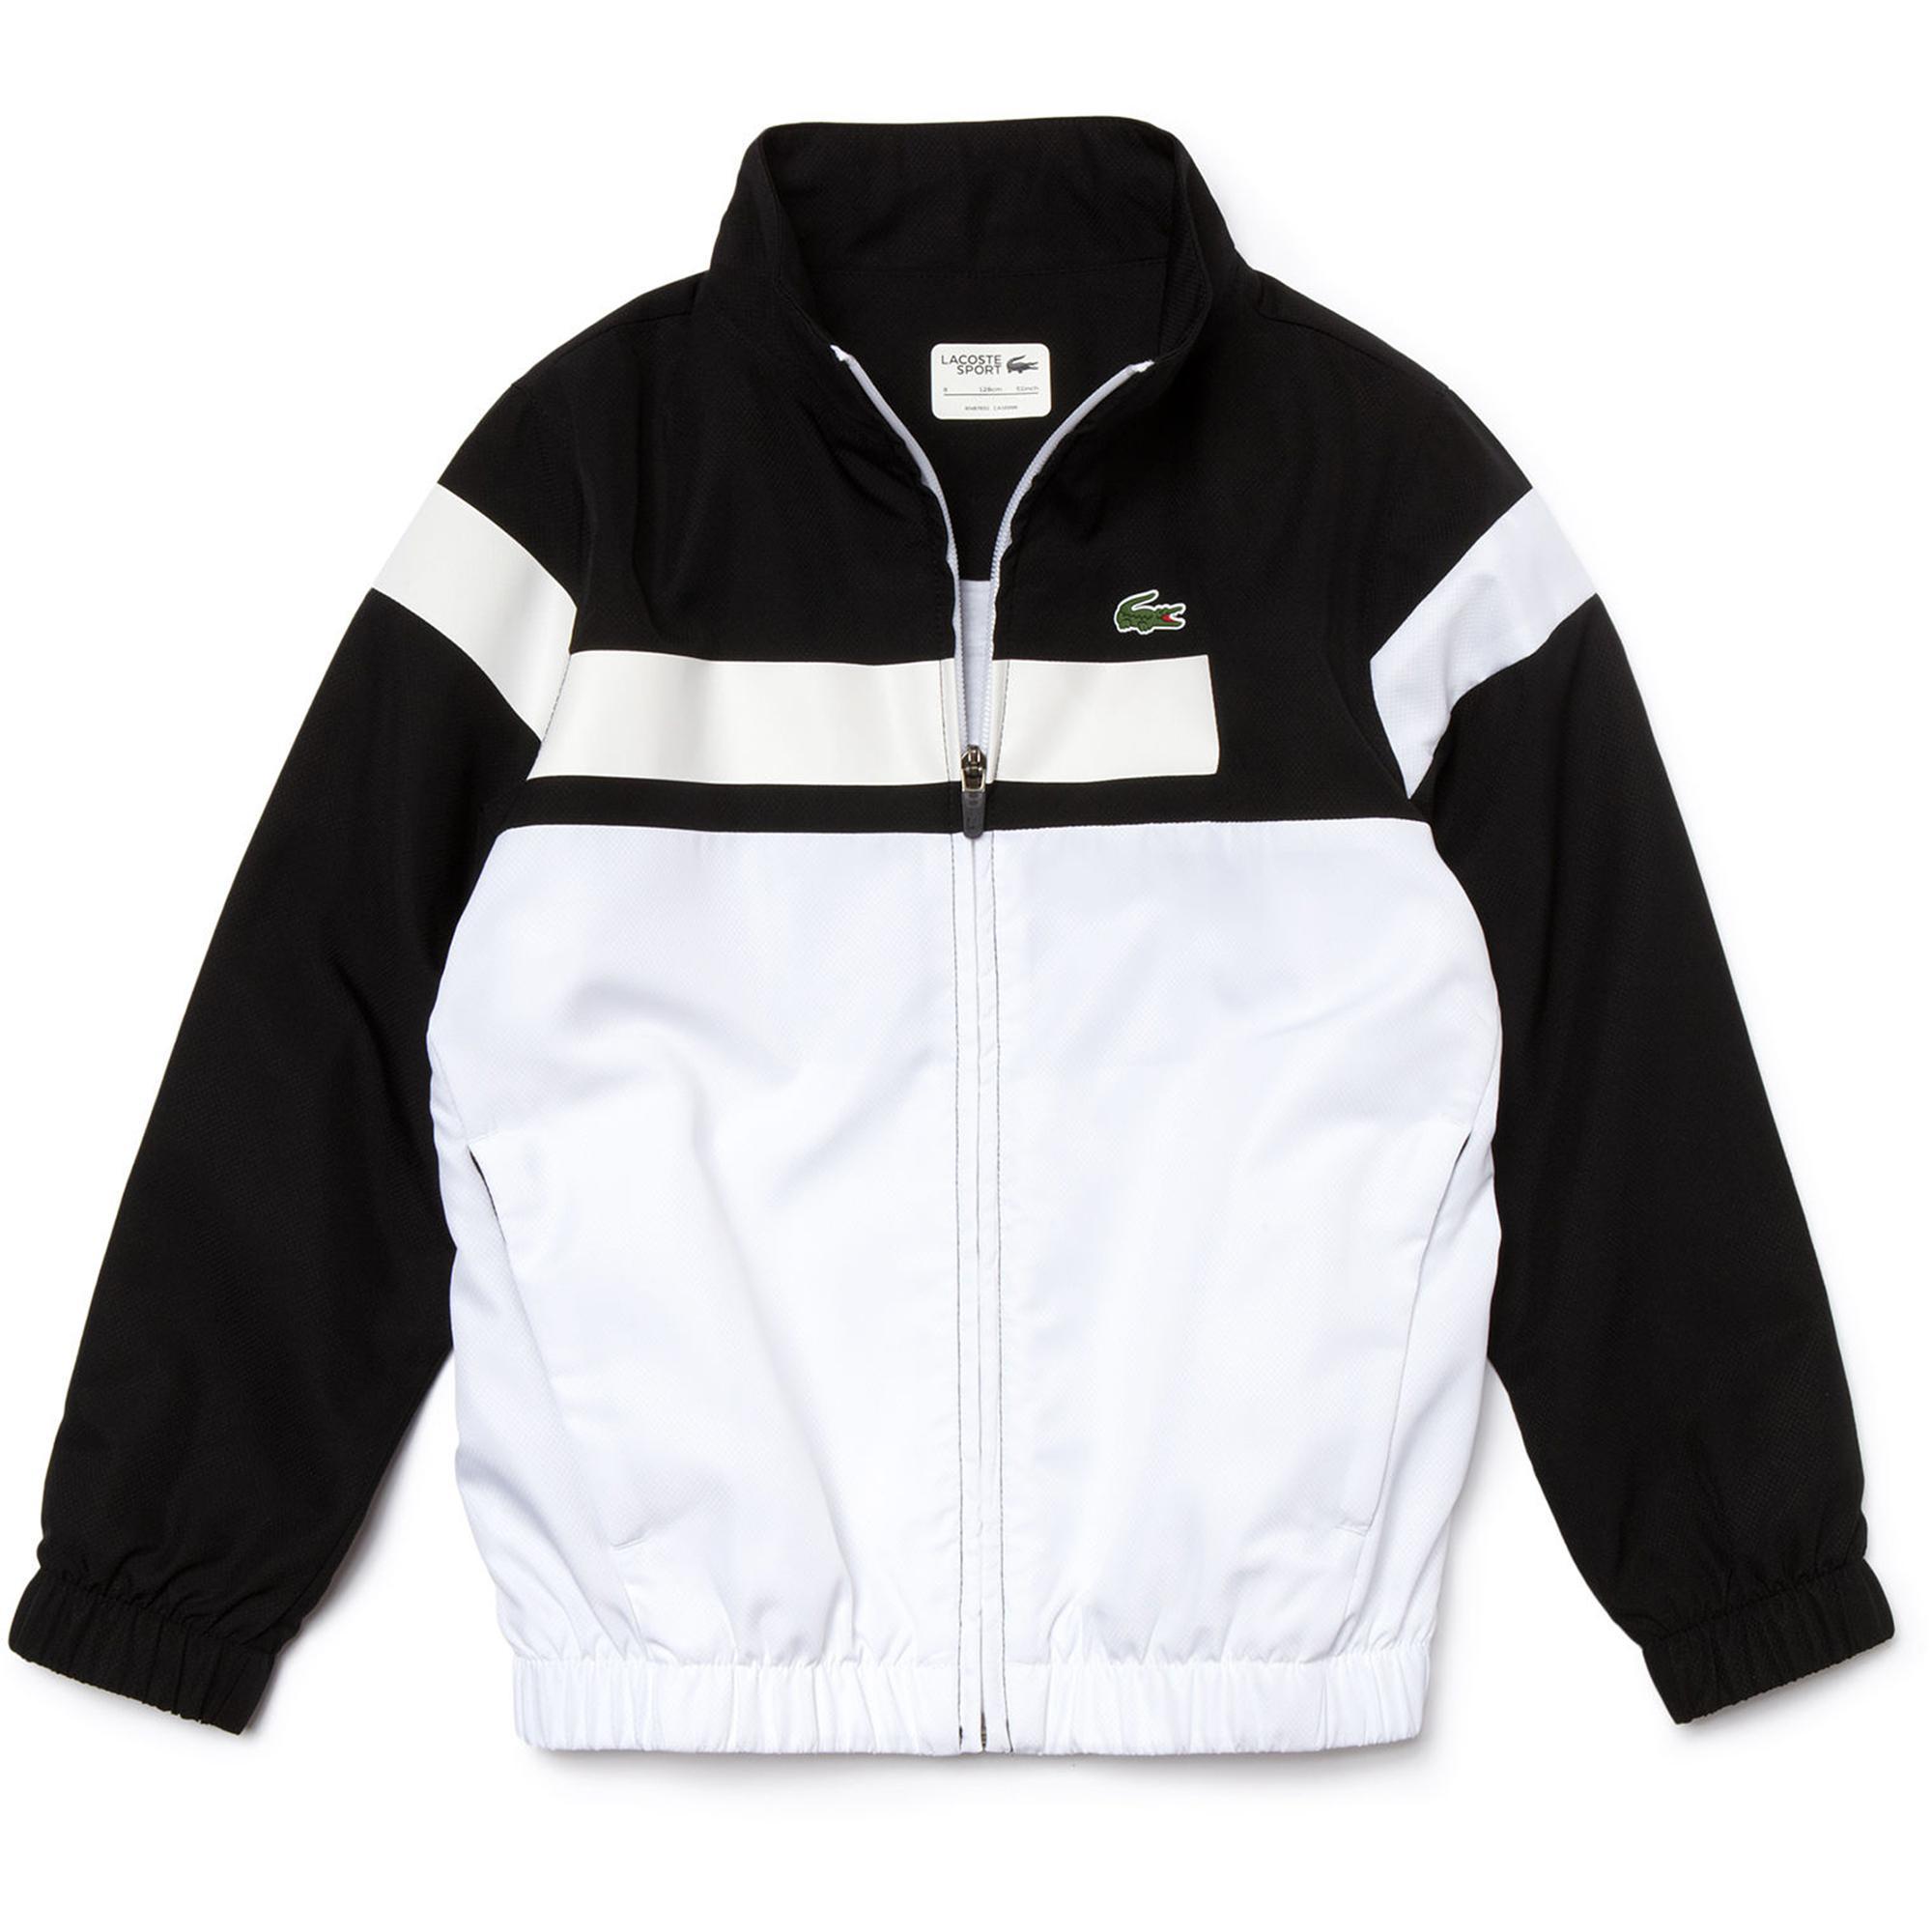 06a72693bafe2f Lacoste Sport Boys Tracksuit - White Black - Tennisnuts.com